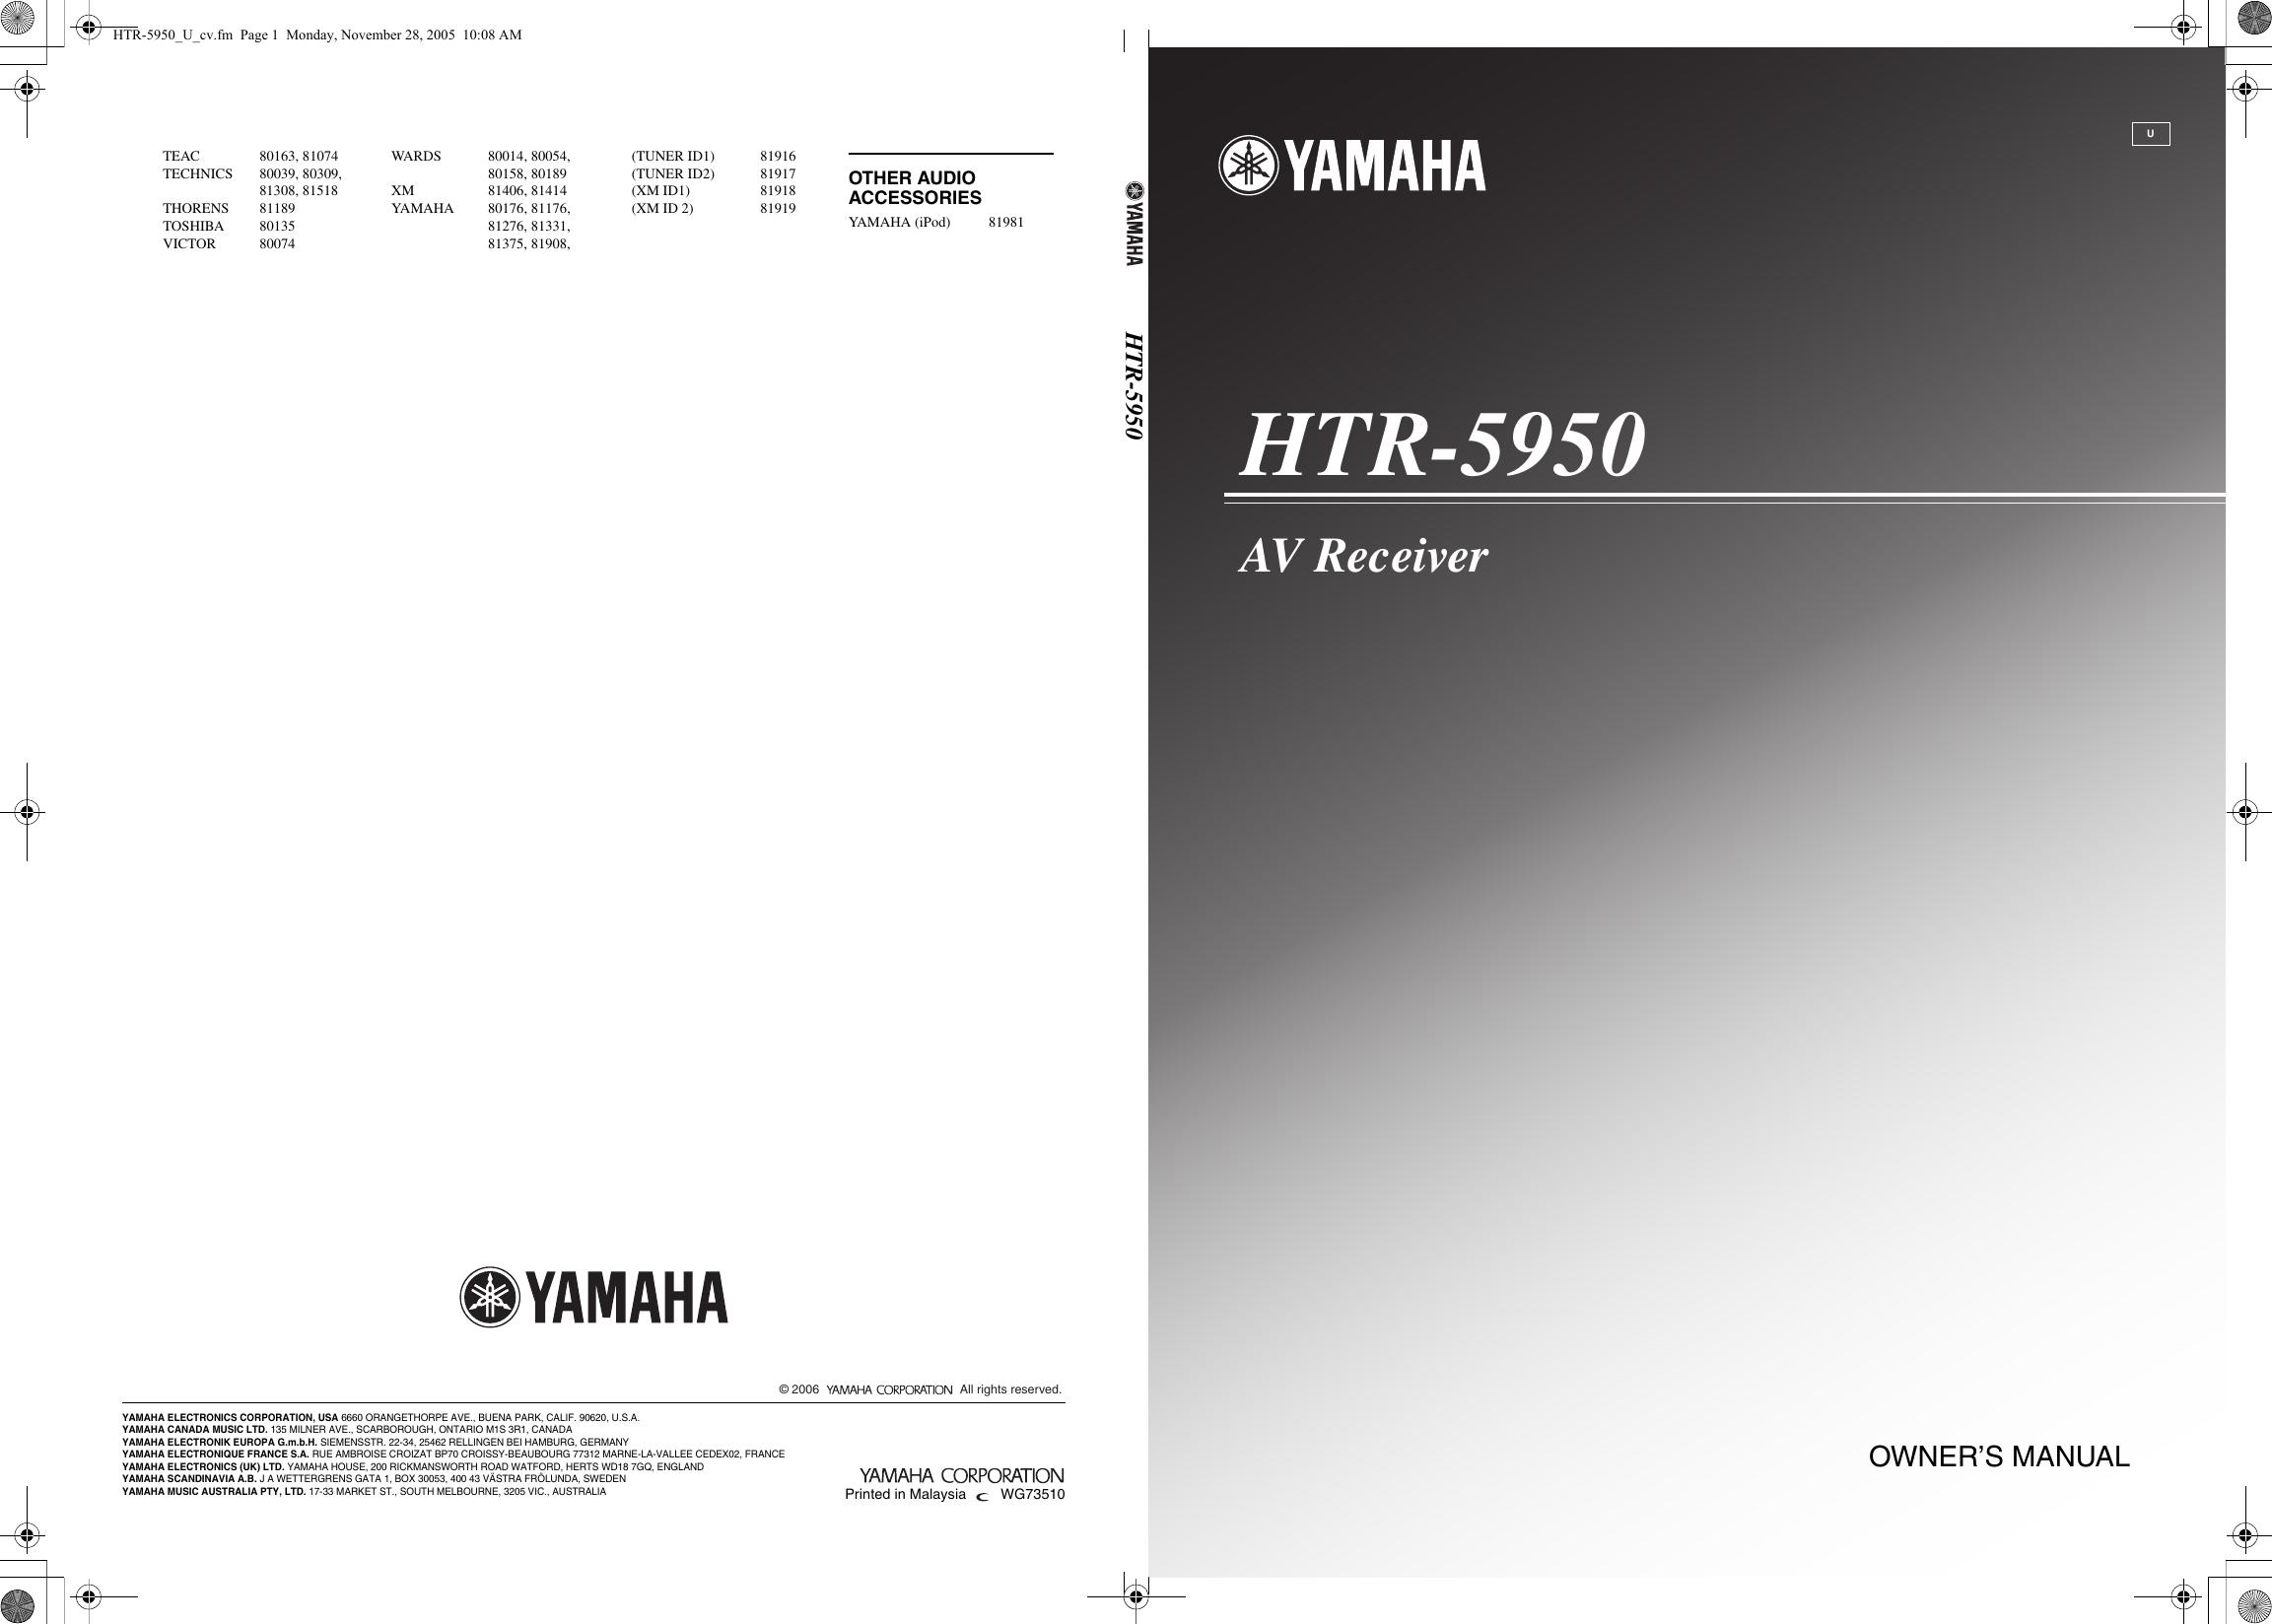 yamaha htr 5950 owners manual rh usermanual wiki